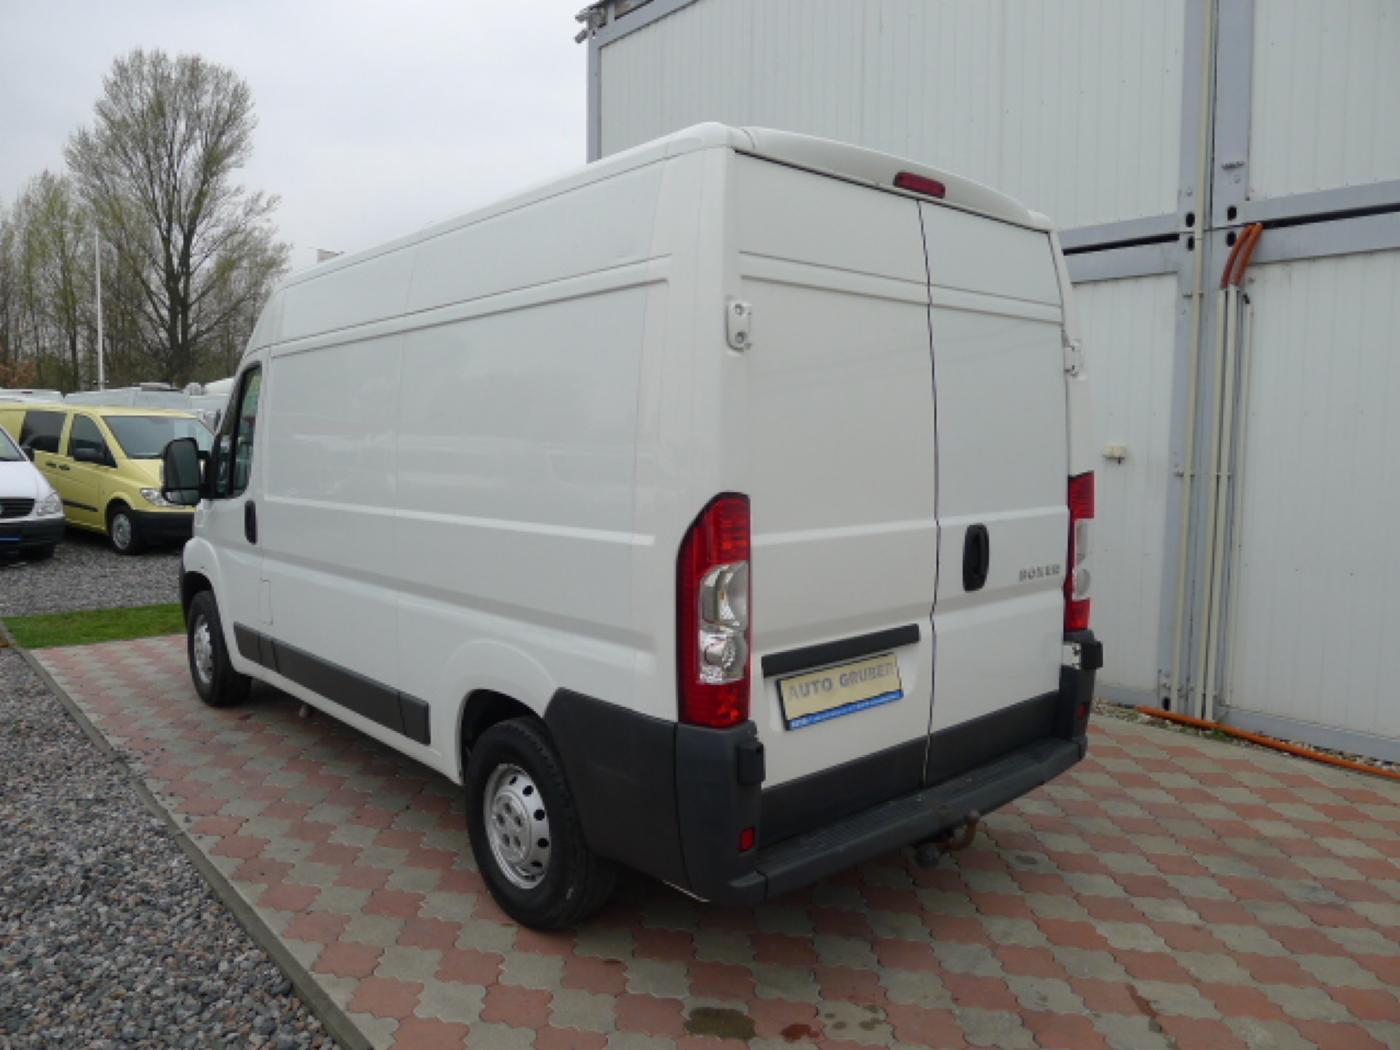 Peugeot Boxer 2.2 HDI L2H2 Klima Akce!!! Novinka - 4